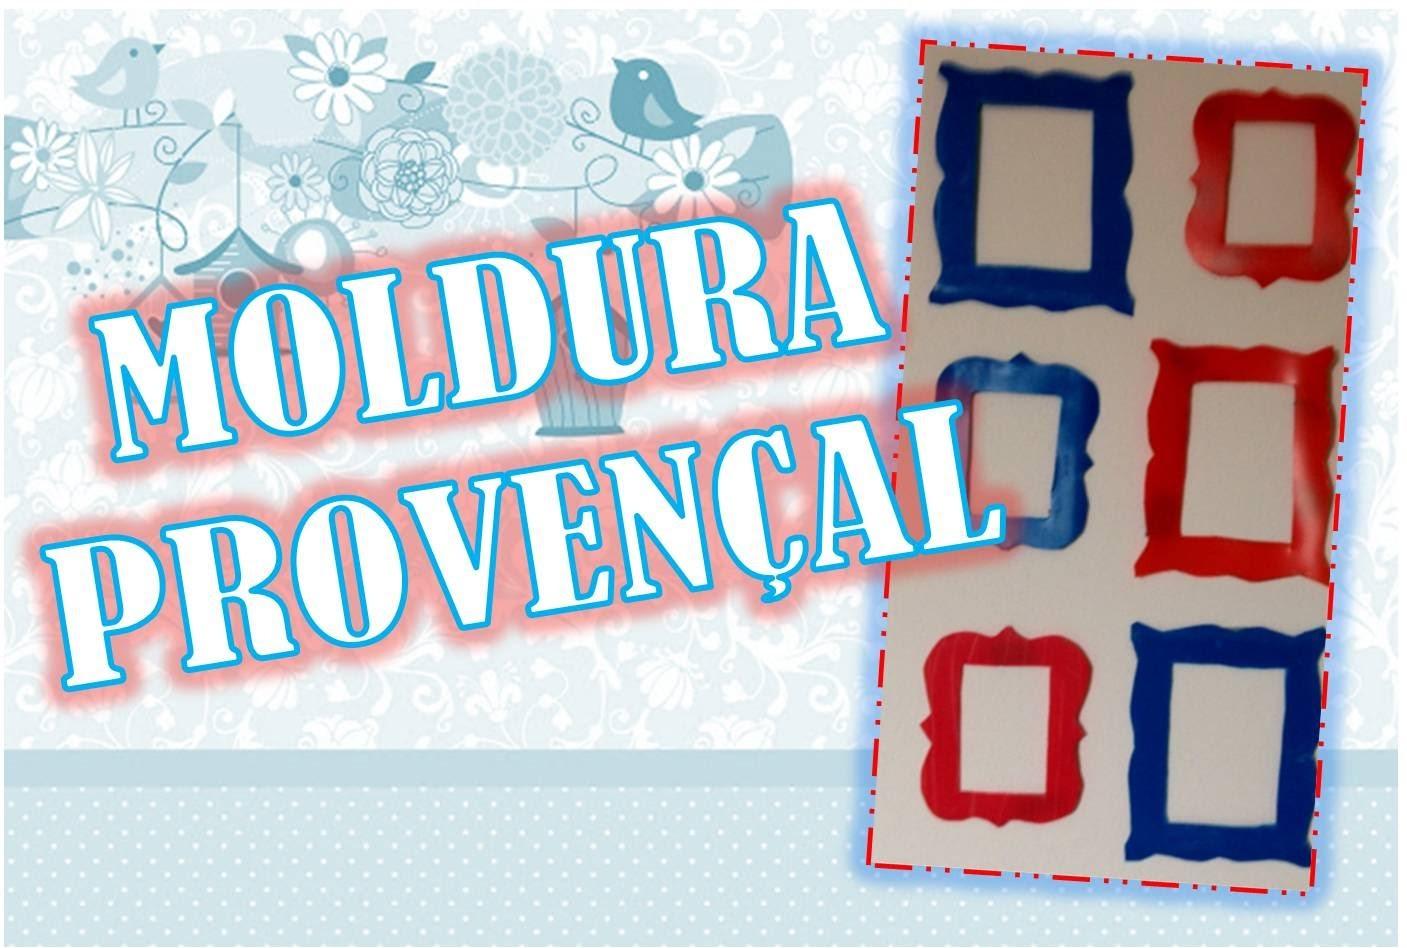 DIY - Moldura provençal sem gastar nada!